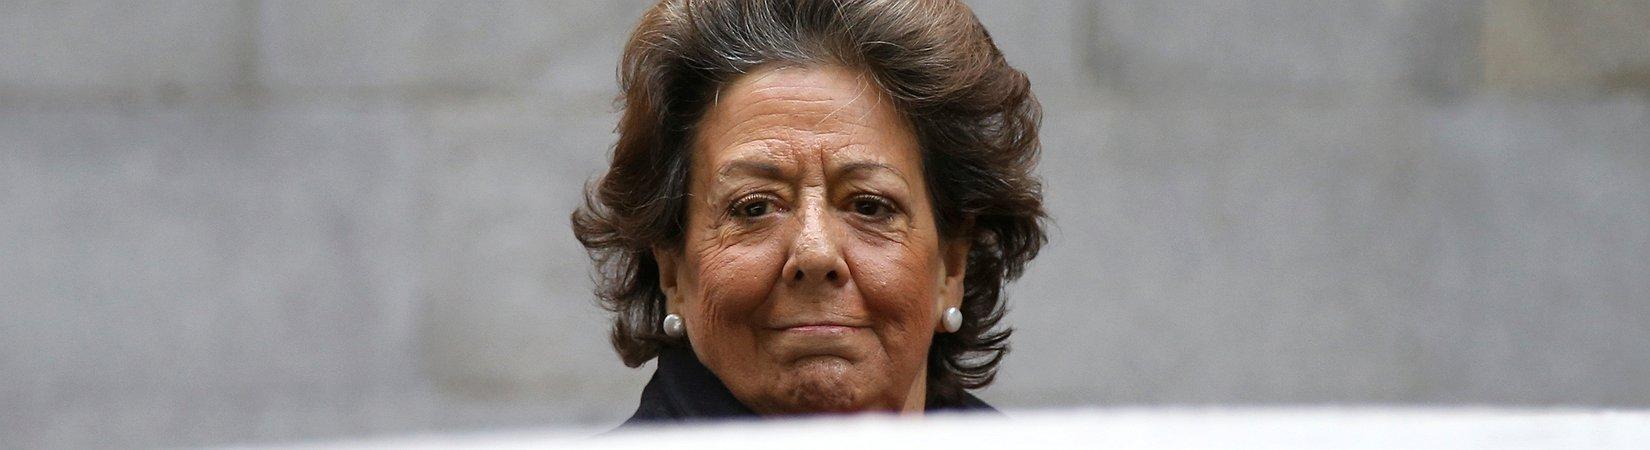 Fallece Rita Barberá tras sufrir un infarto